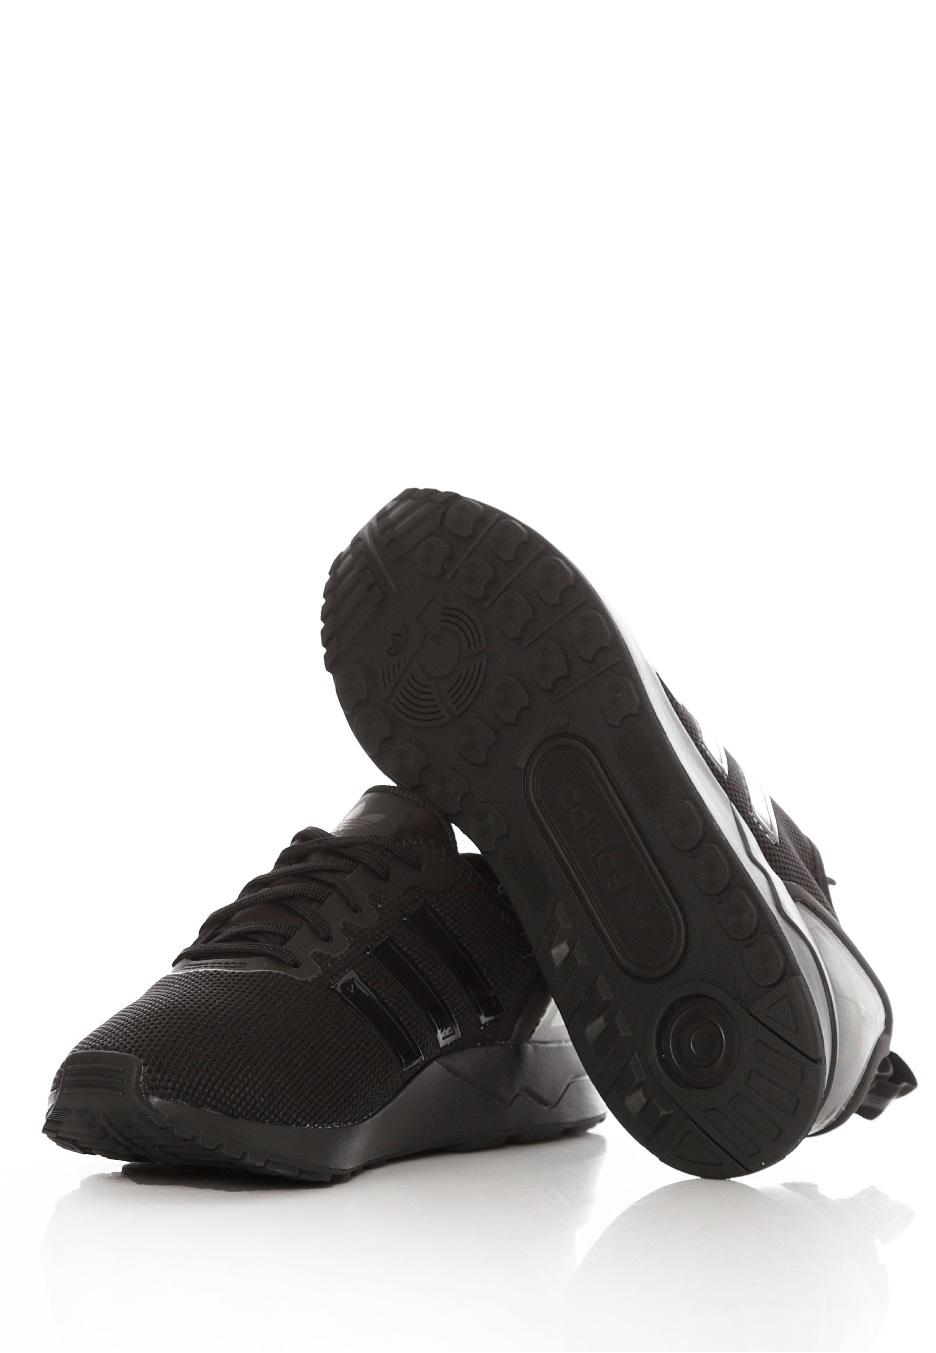 abc2c39db770 ... where can i buy adidas zx flux adv j core black core black core black  girl